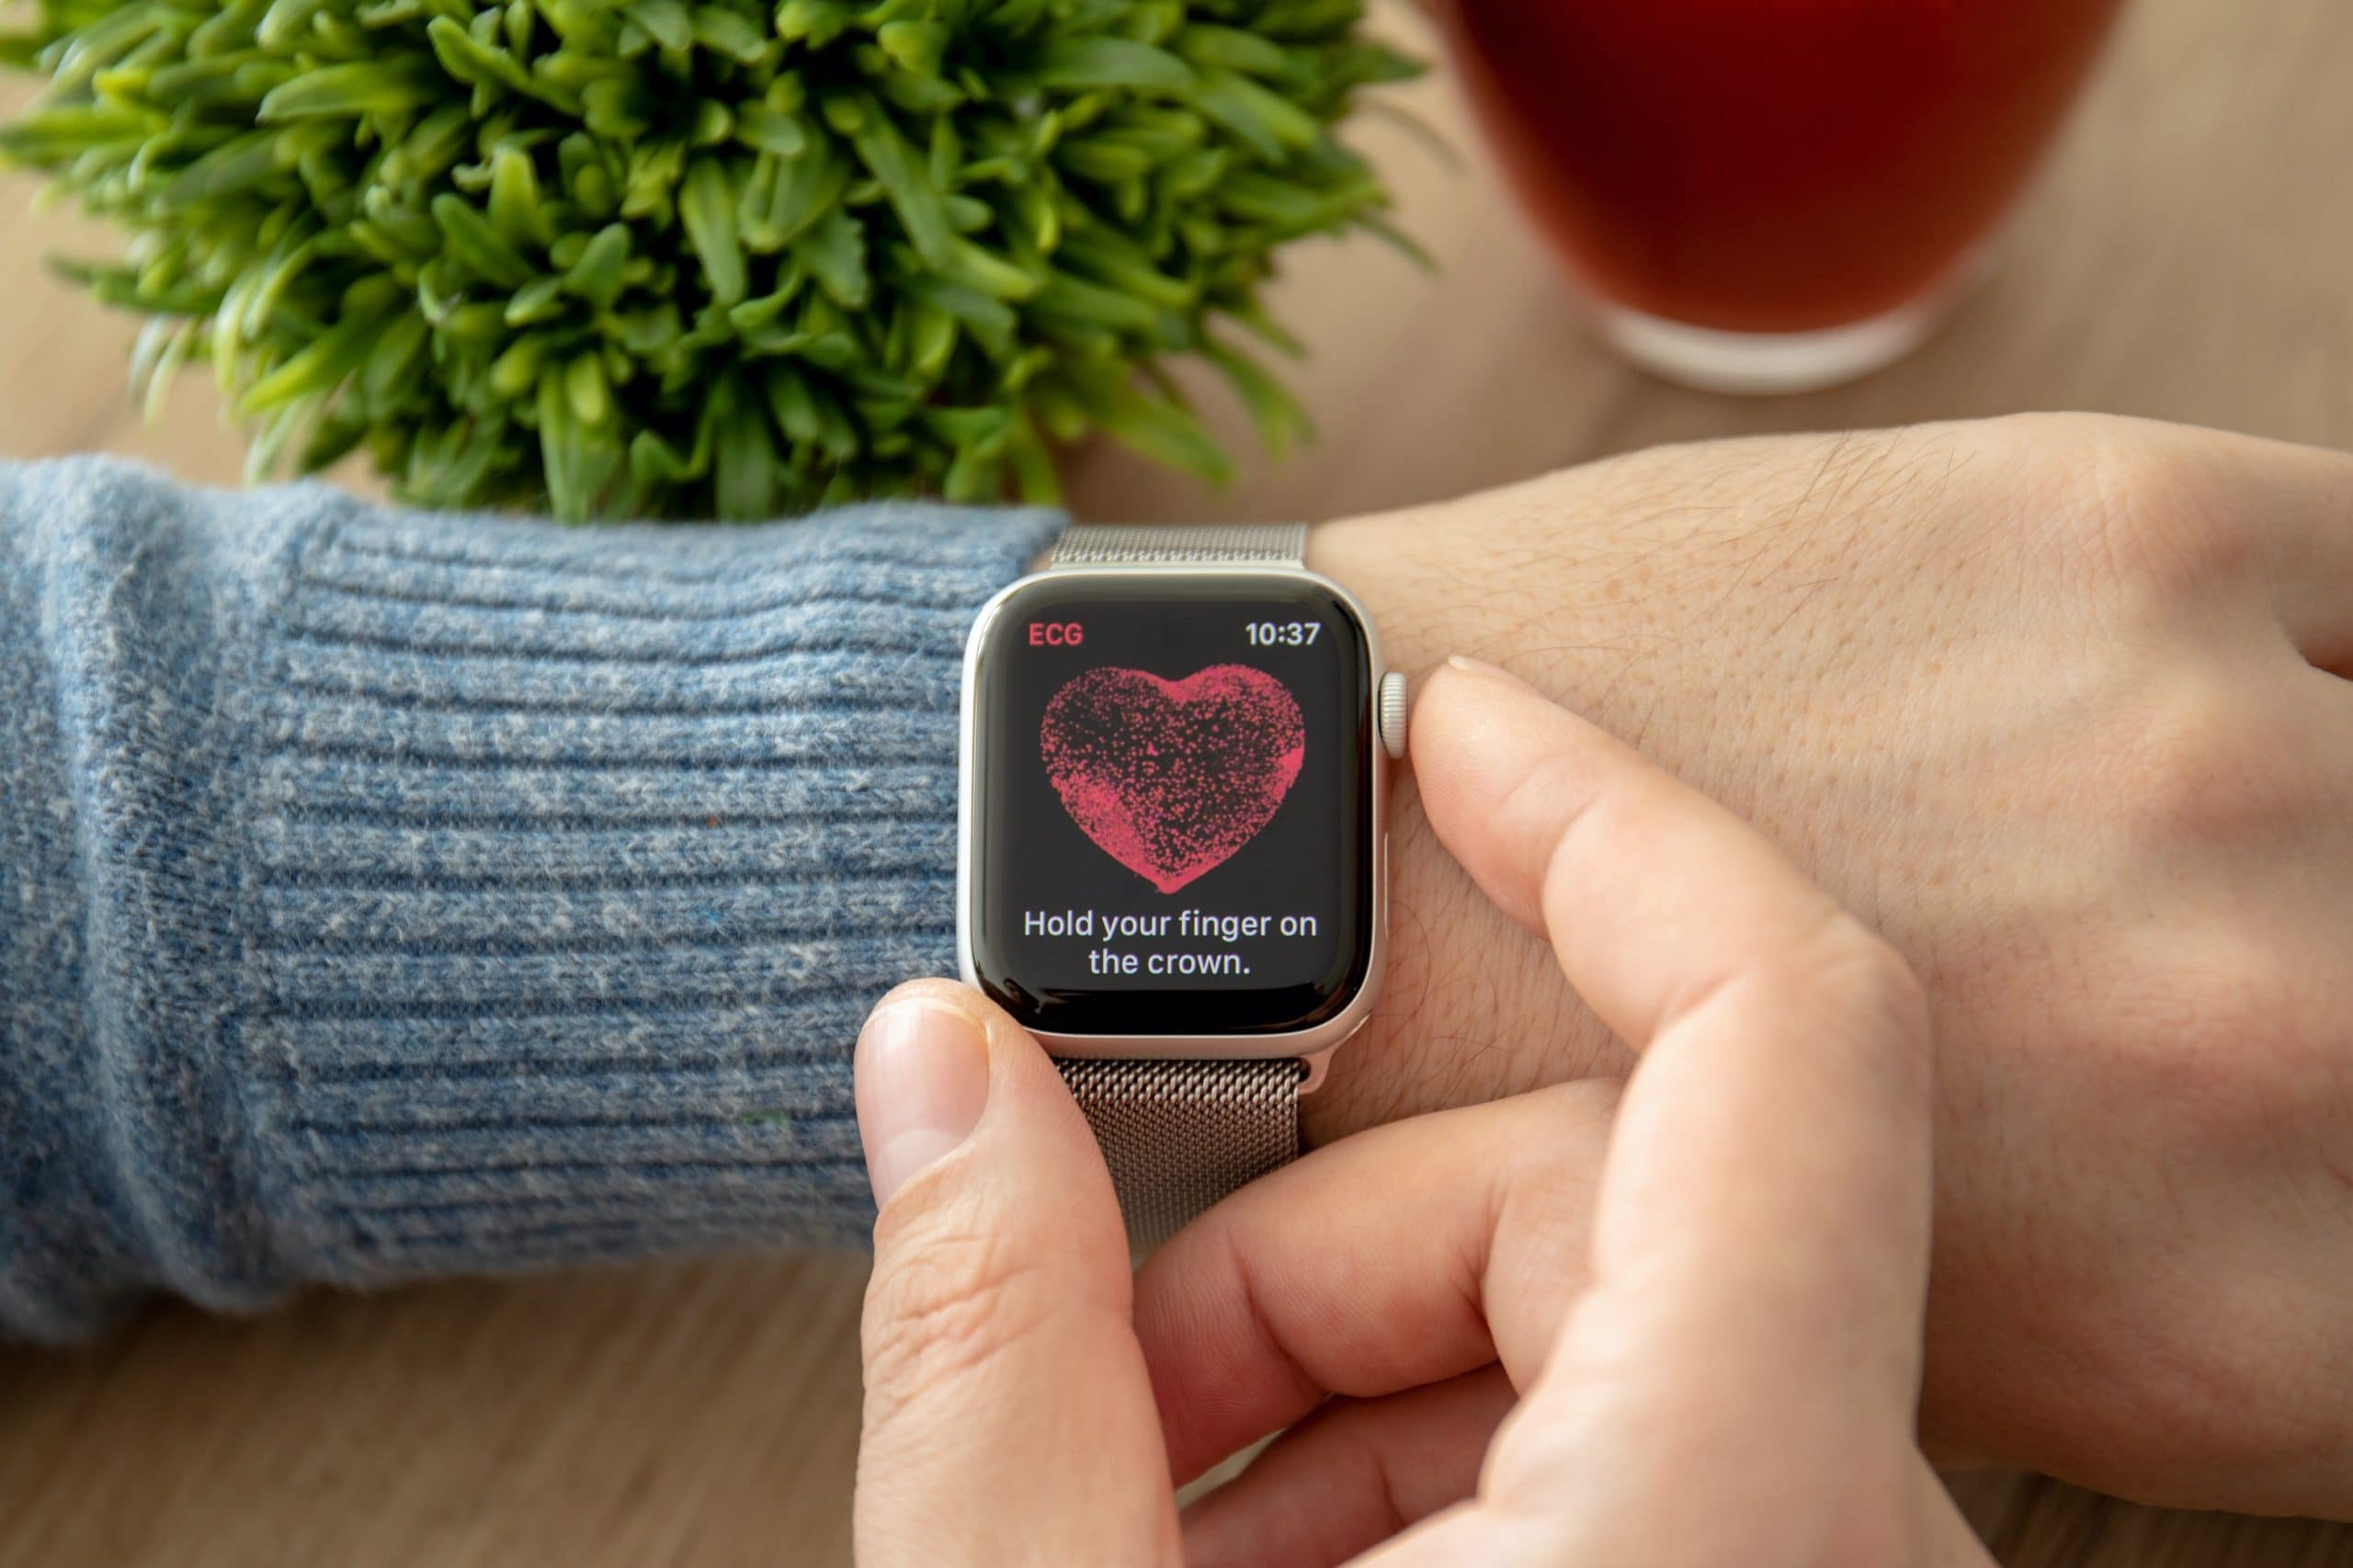 ECG - Apple Watch